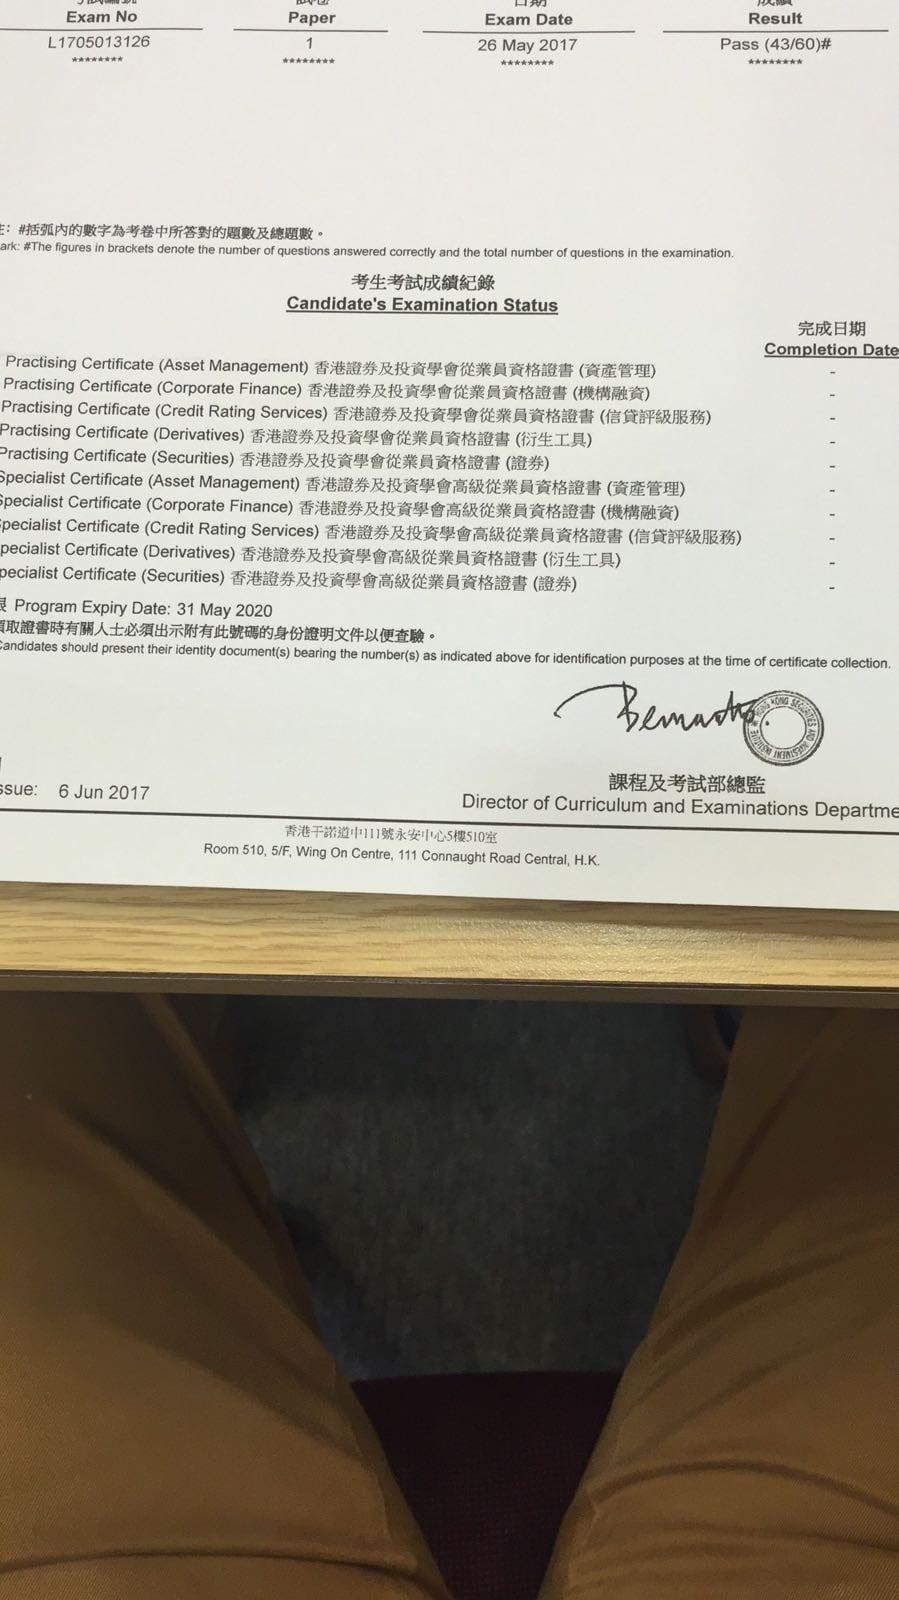 WYW 26/5/2017 LE Paper 1 證券期貨從業員資格考試卷一 Pass